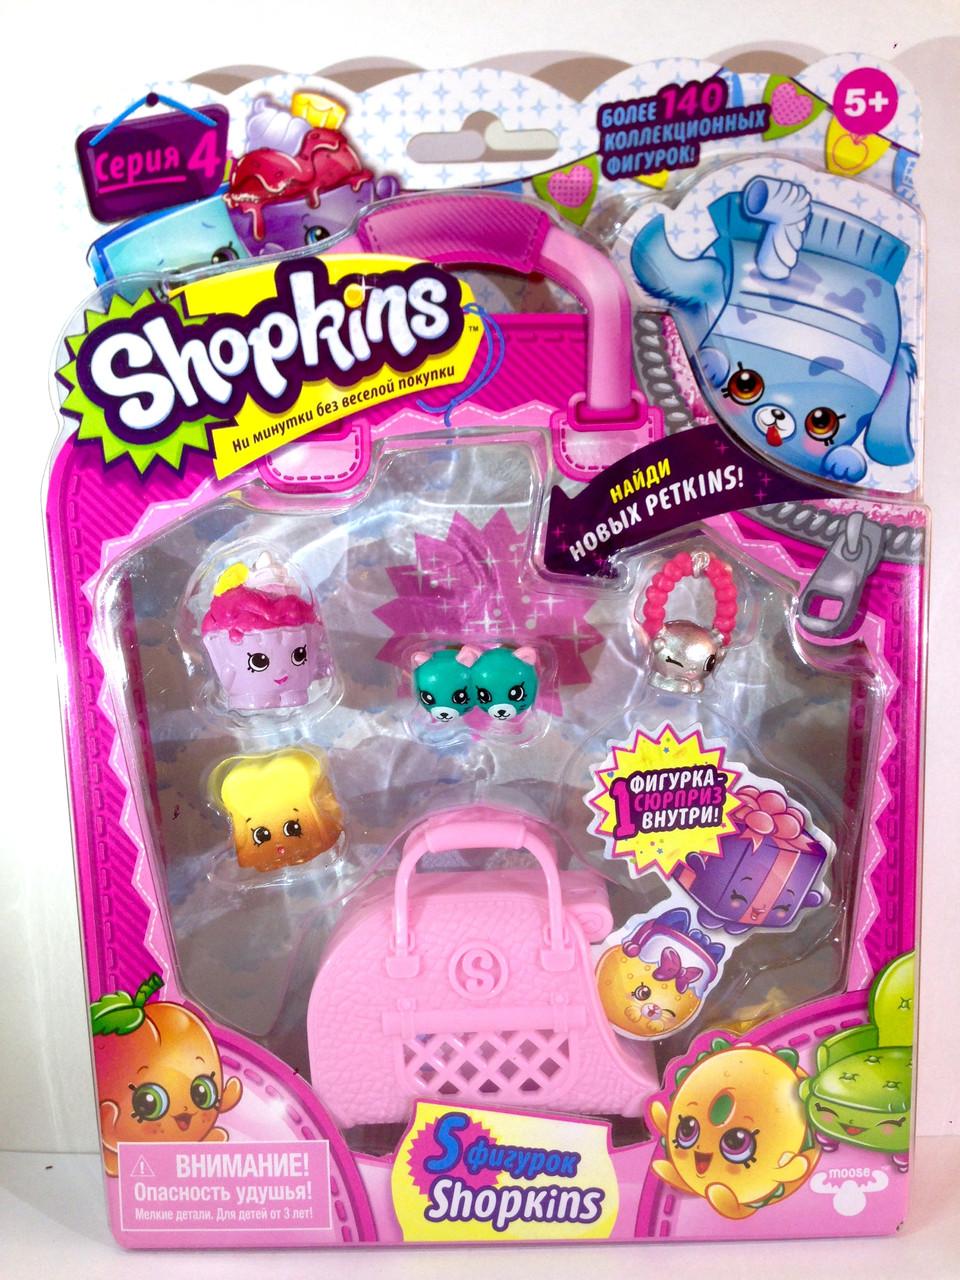 Shopkins, Шопкинс (4 сезон) 5 игрушек в упаковке (котята)